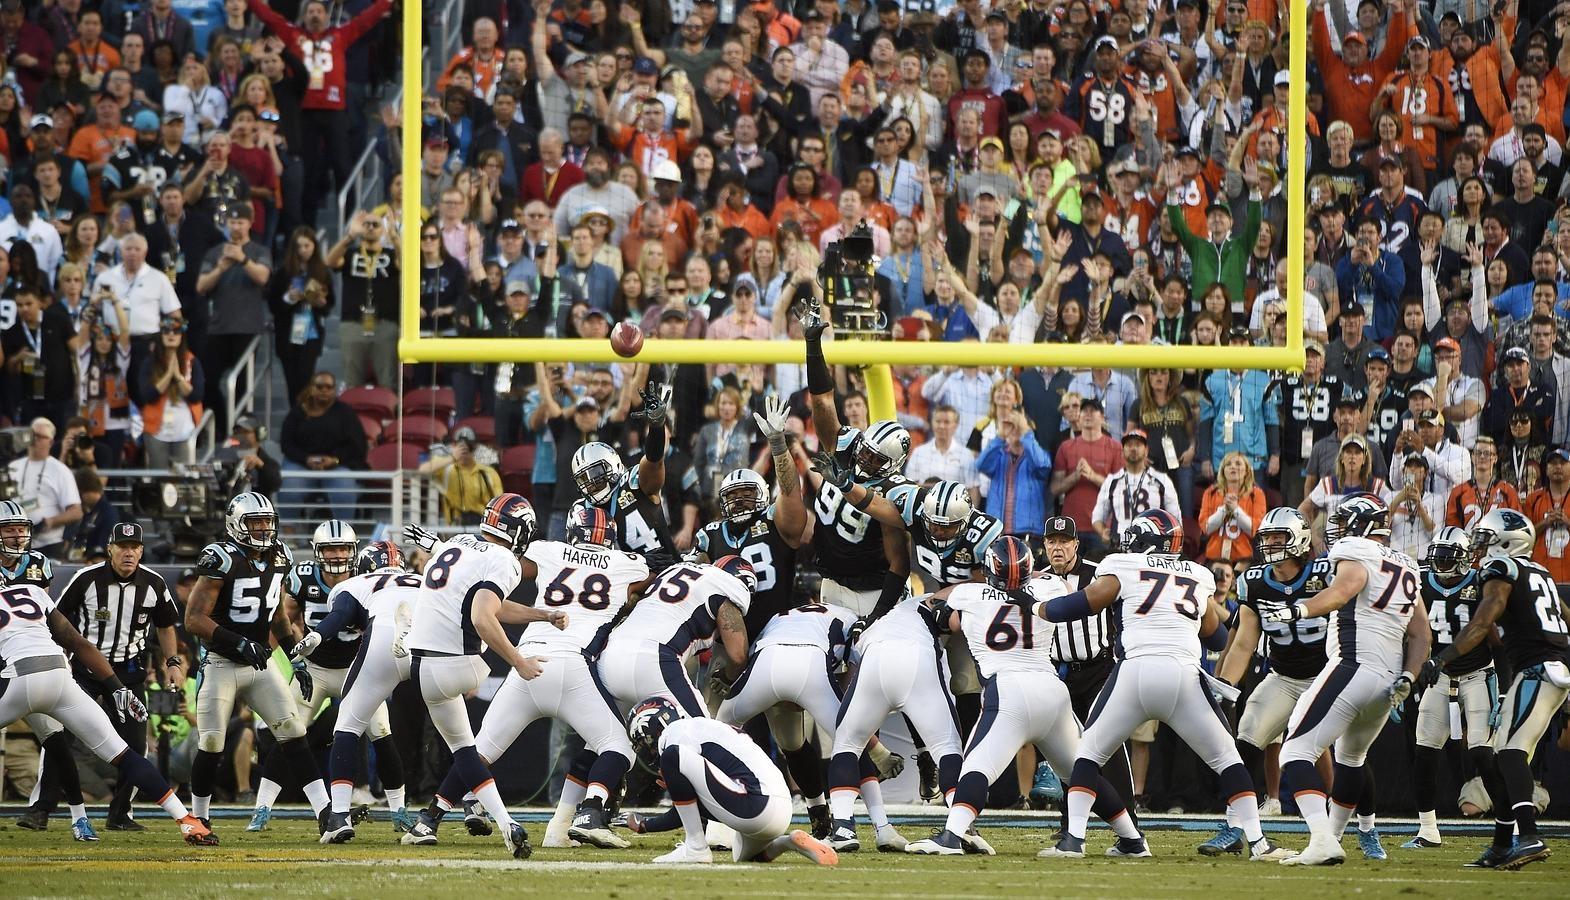 Las mejores fotos de la final de la NFL